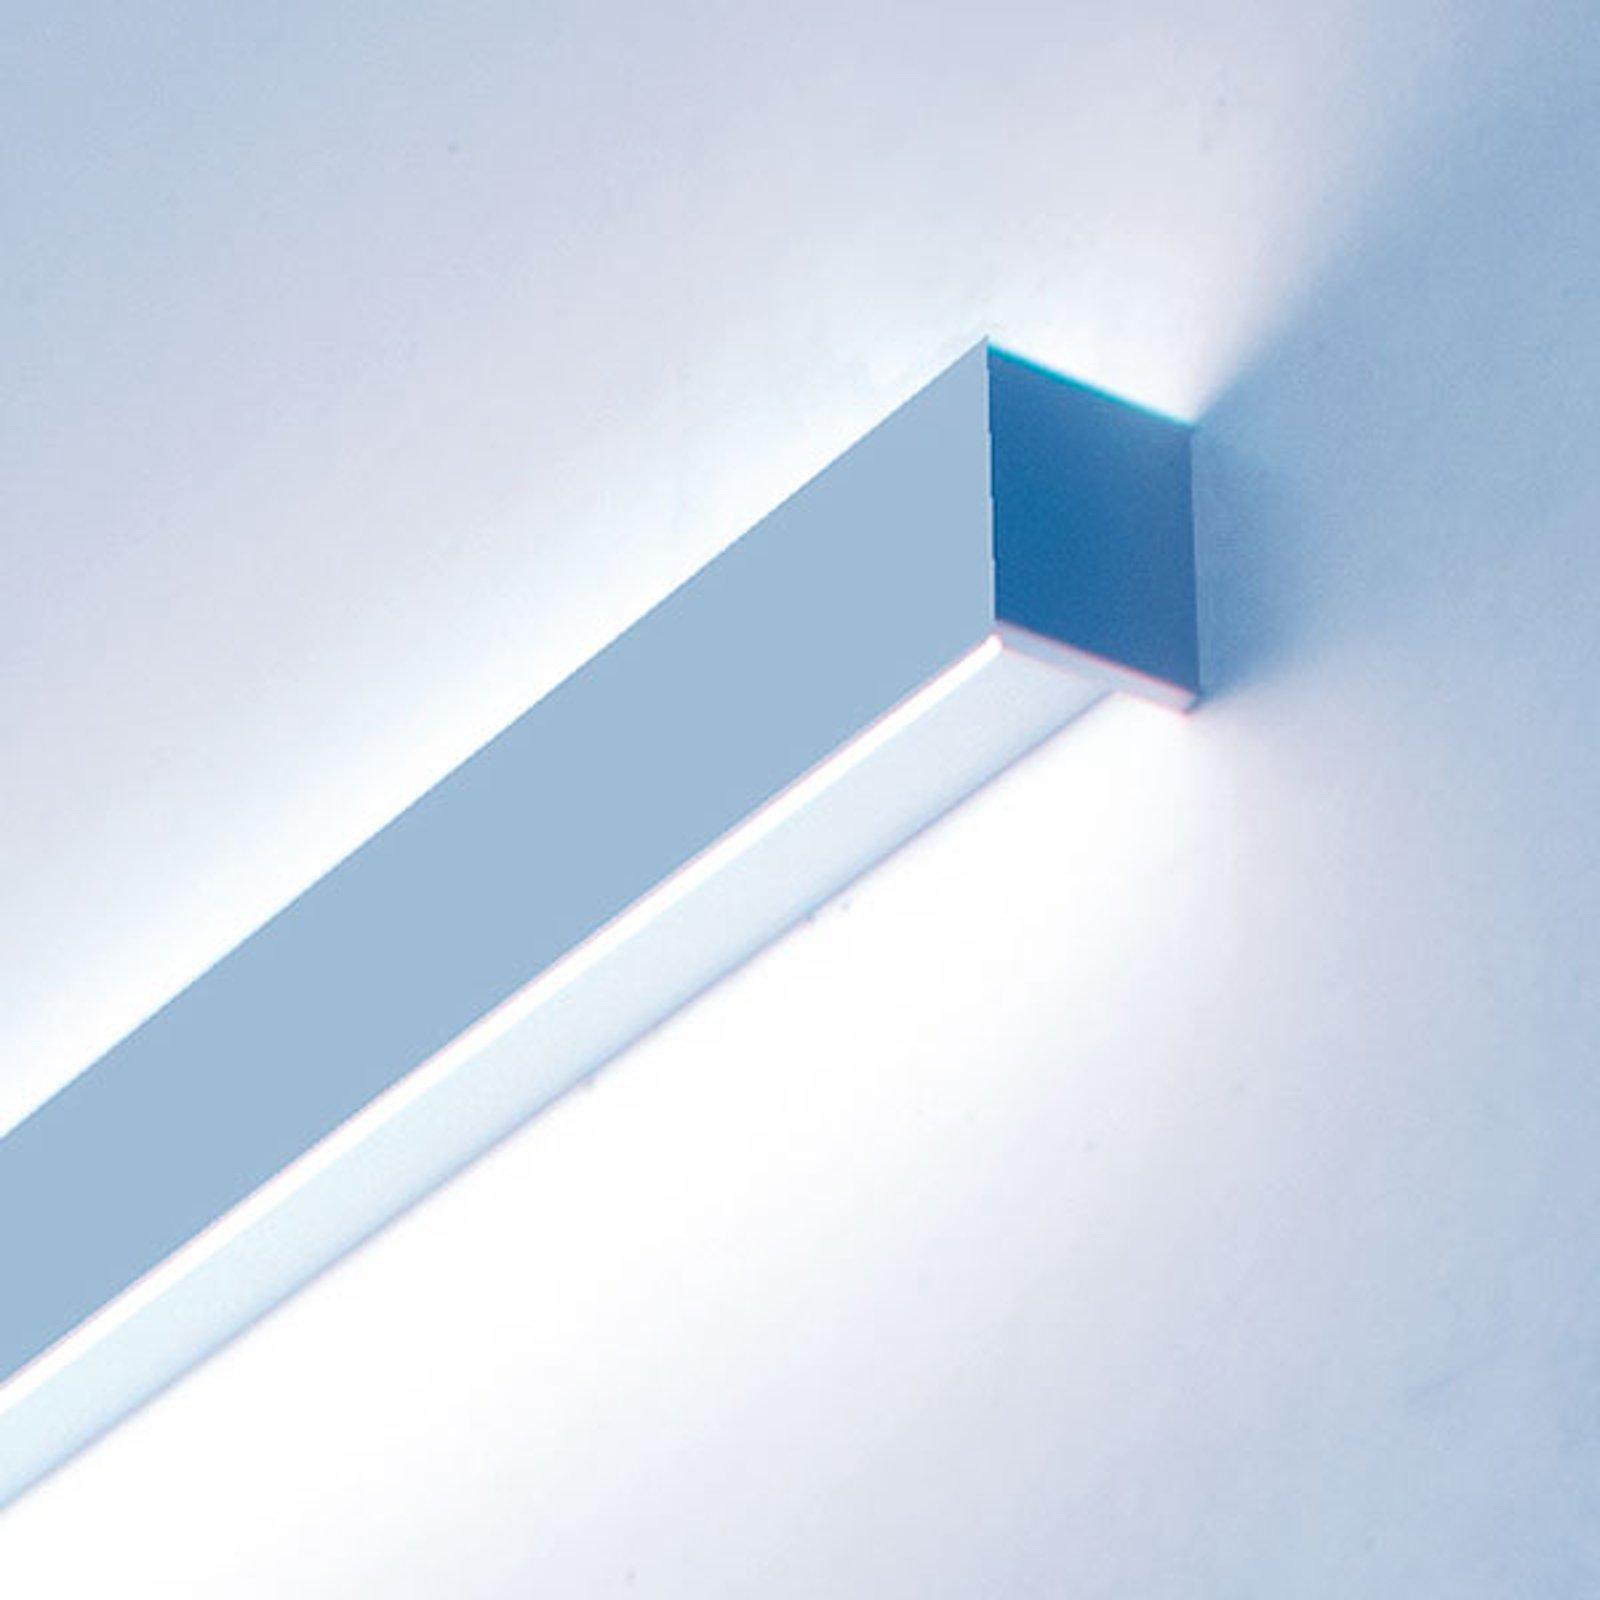 Matric W1 LED-vegglampe i 118,5 cm, 4 000 K